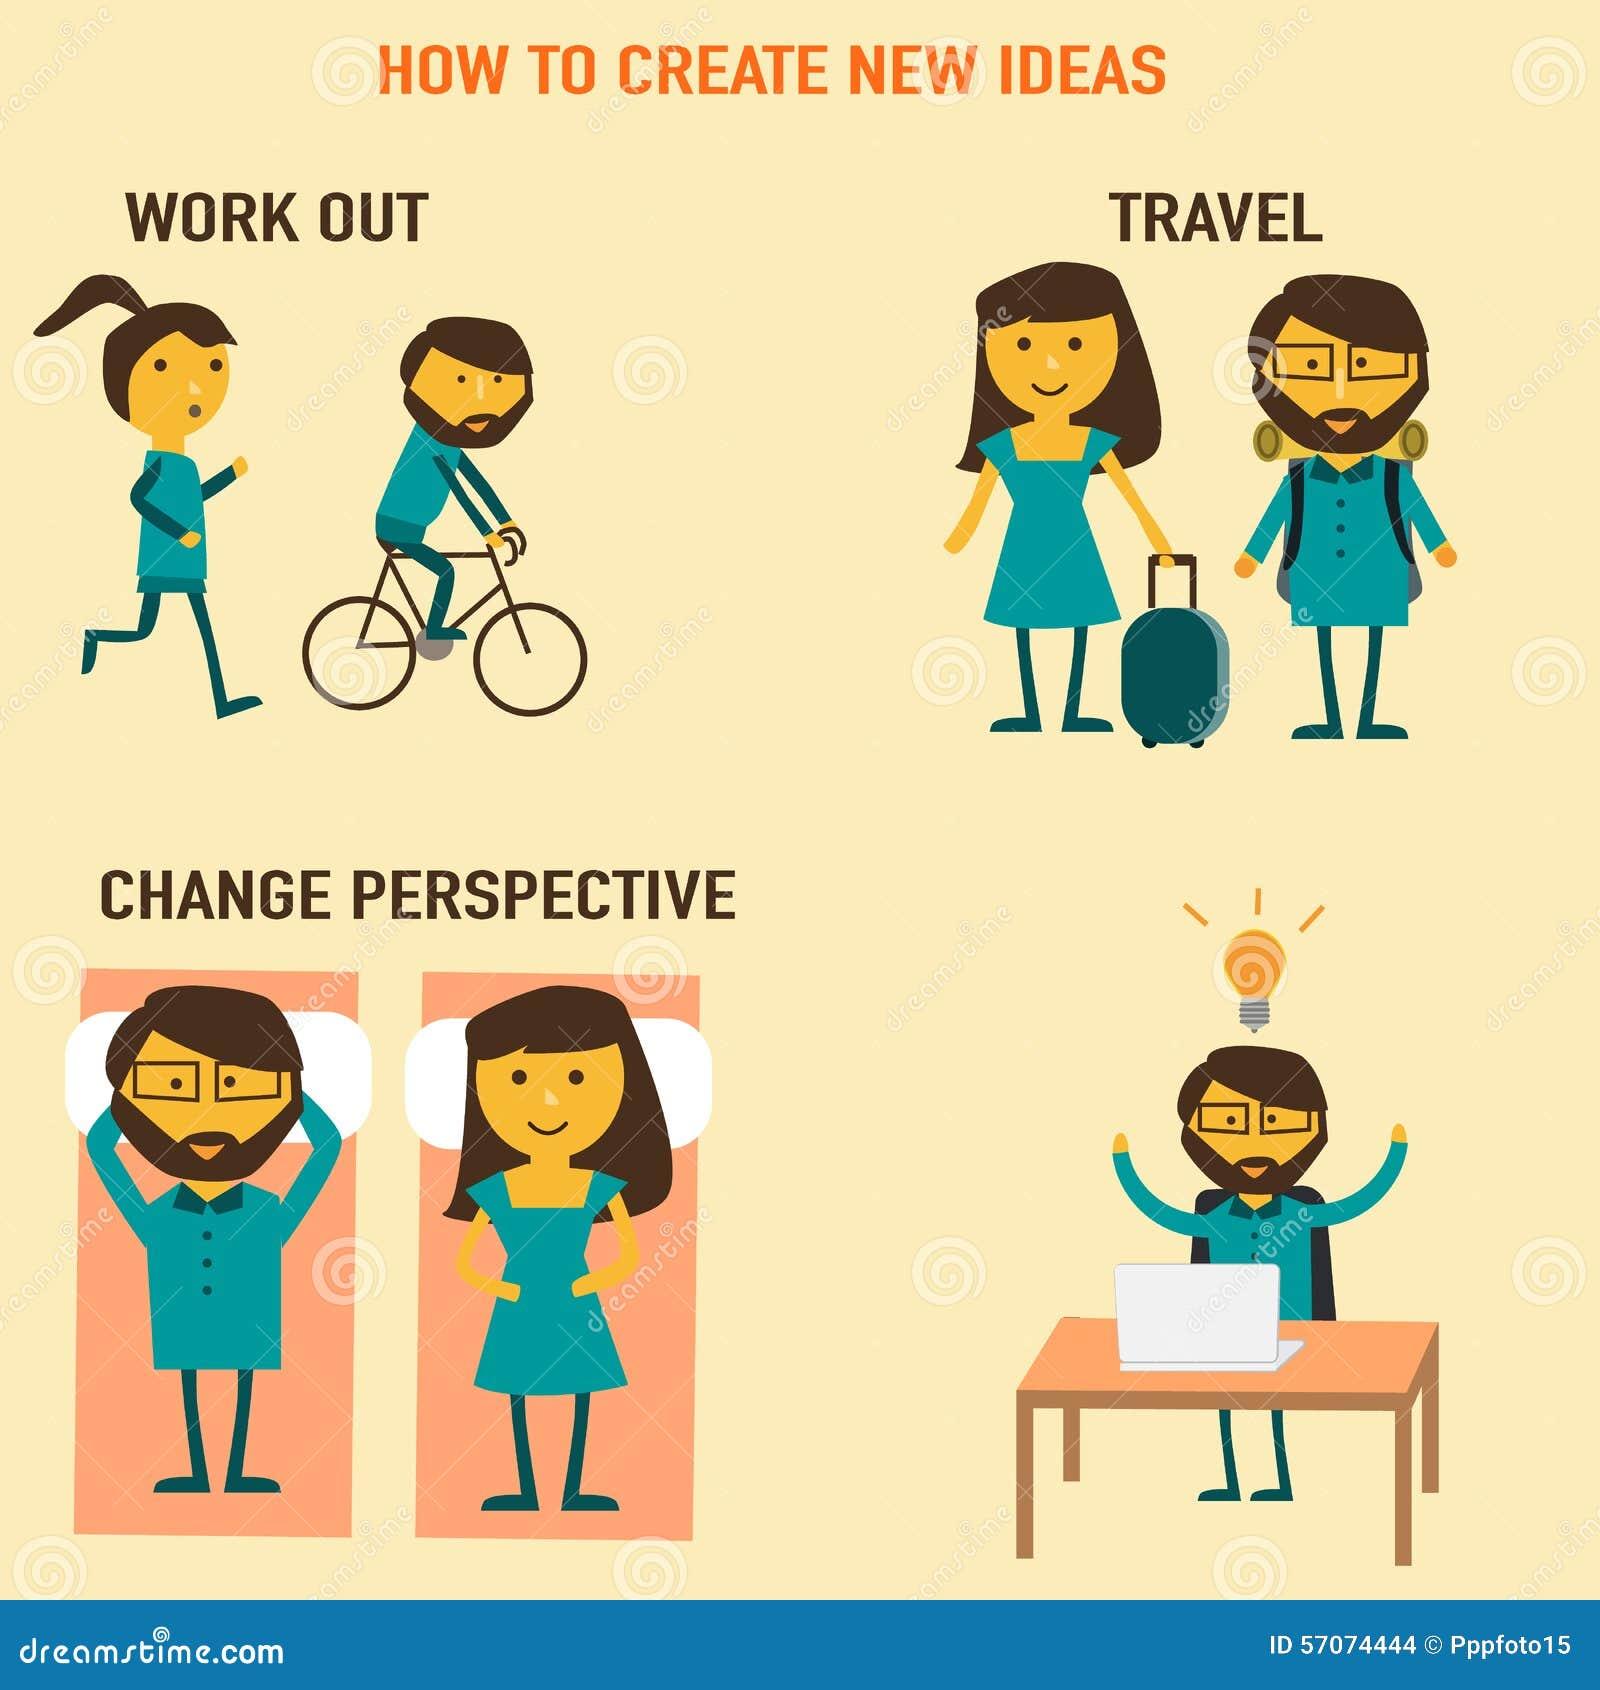 Hoe te om nieuwe ideeënvector tot stand te brengen werk, reis, verander perspecti uit